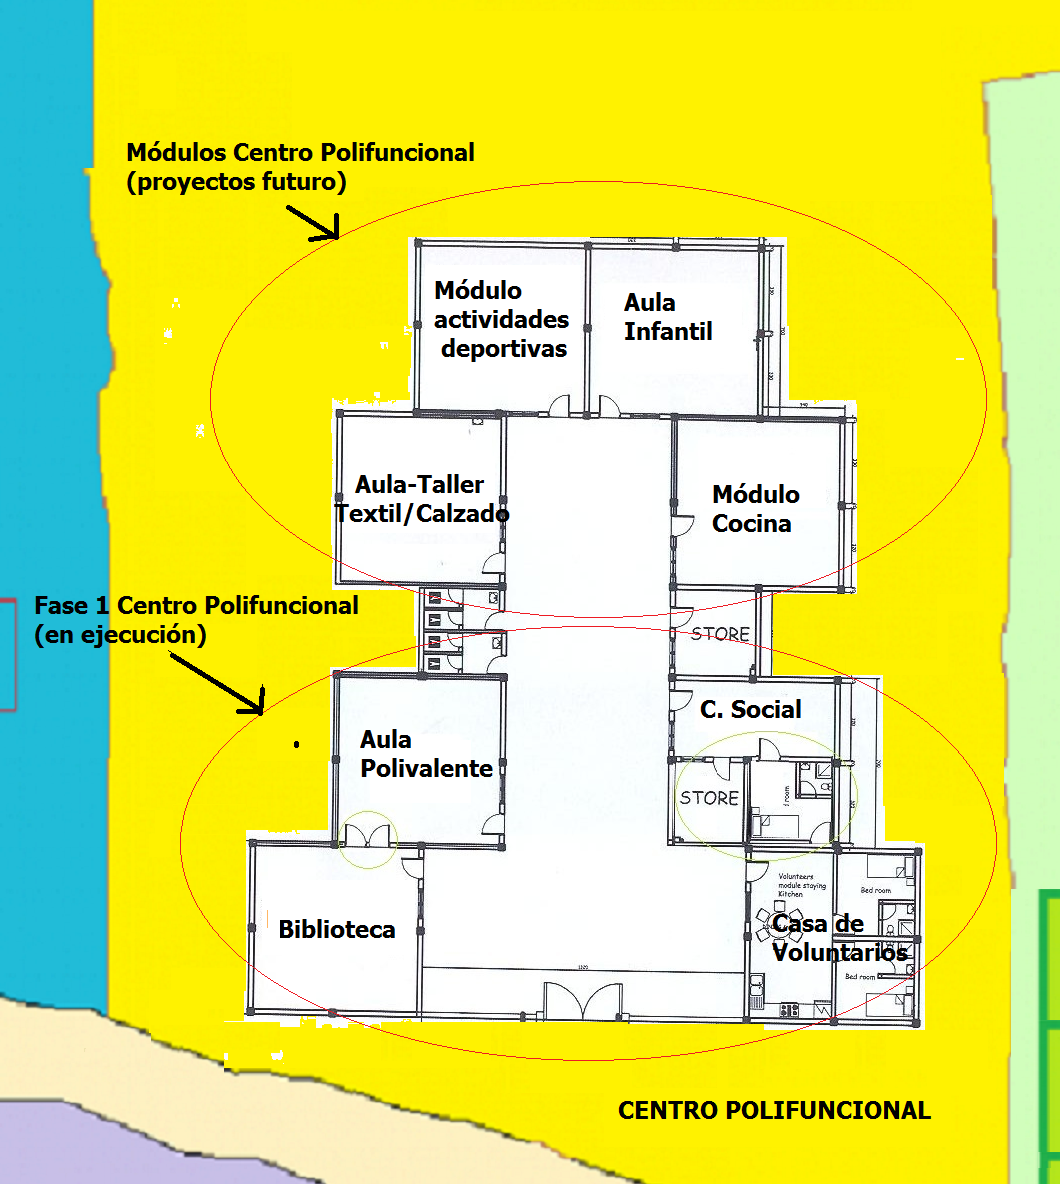 Centro polifuncional